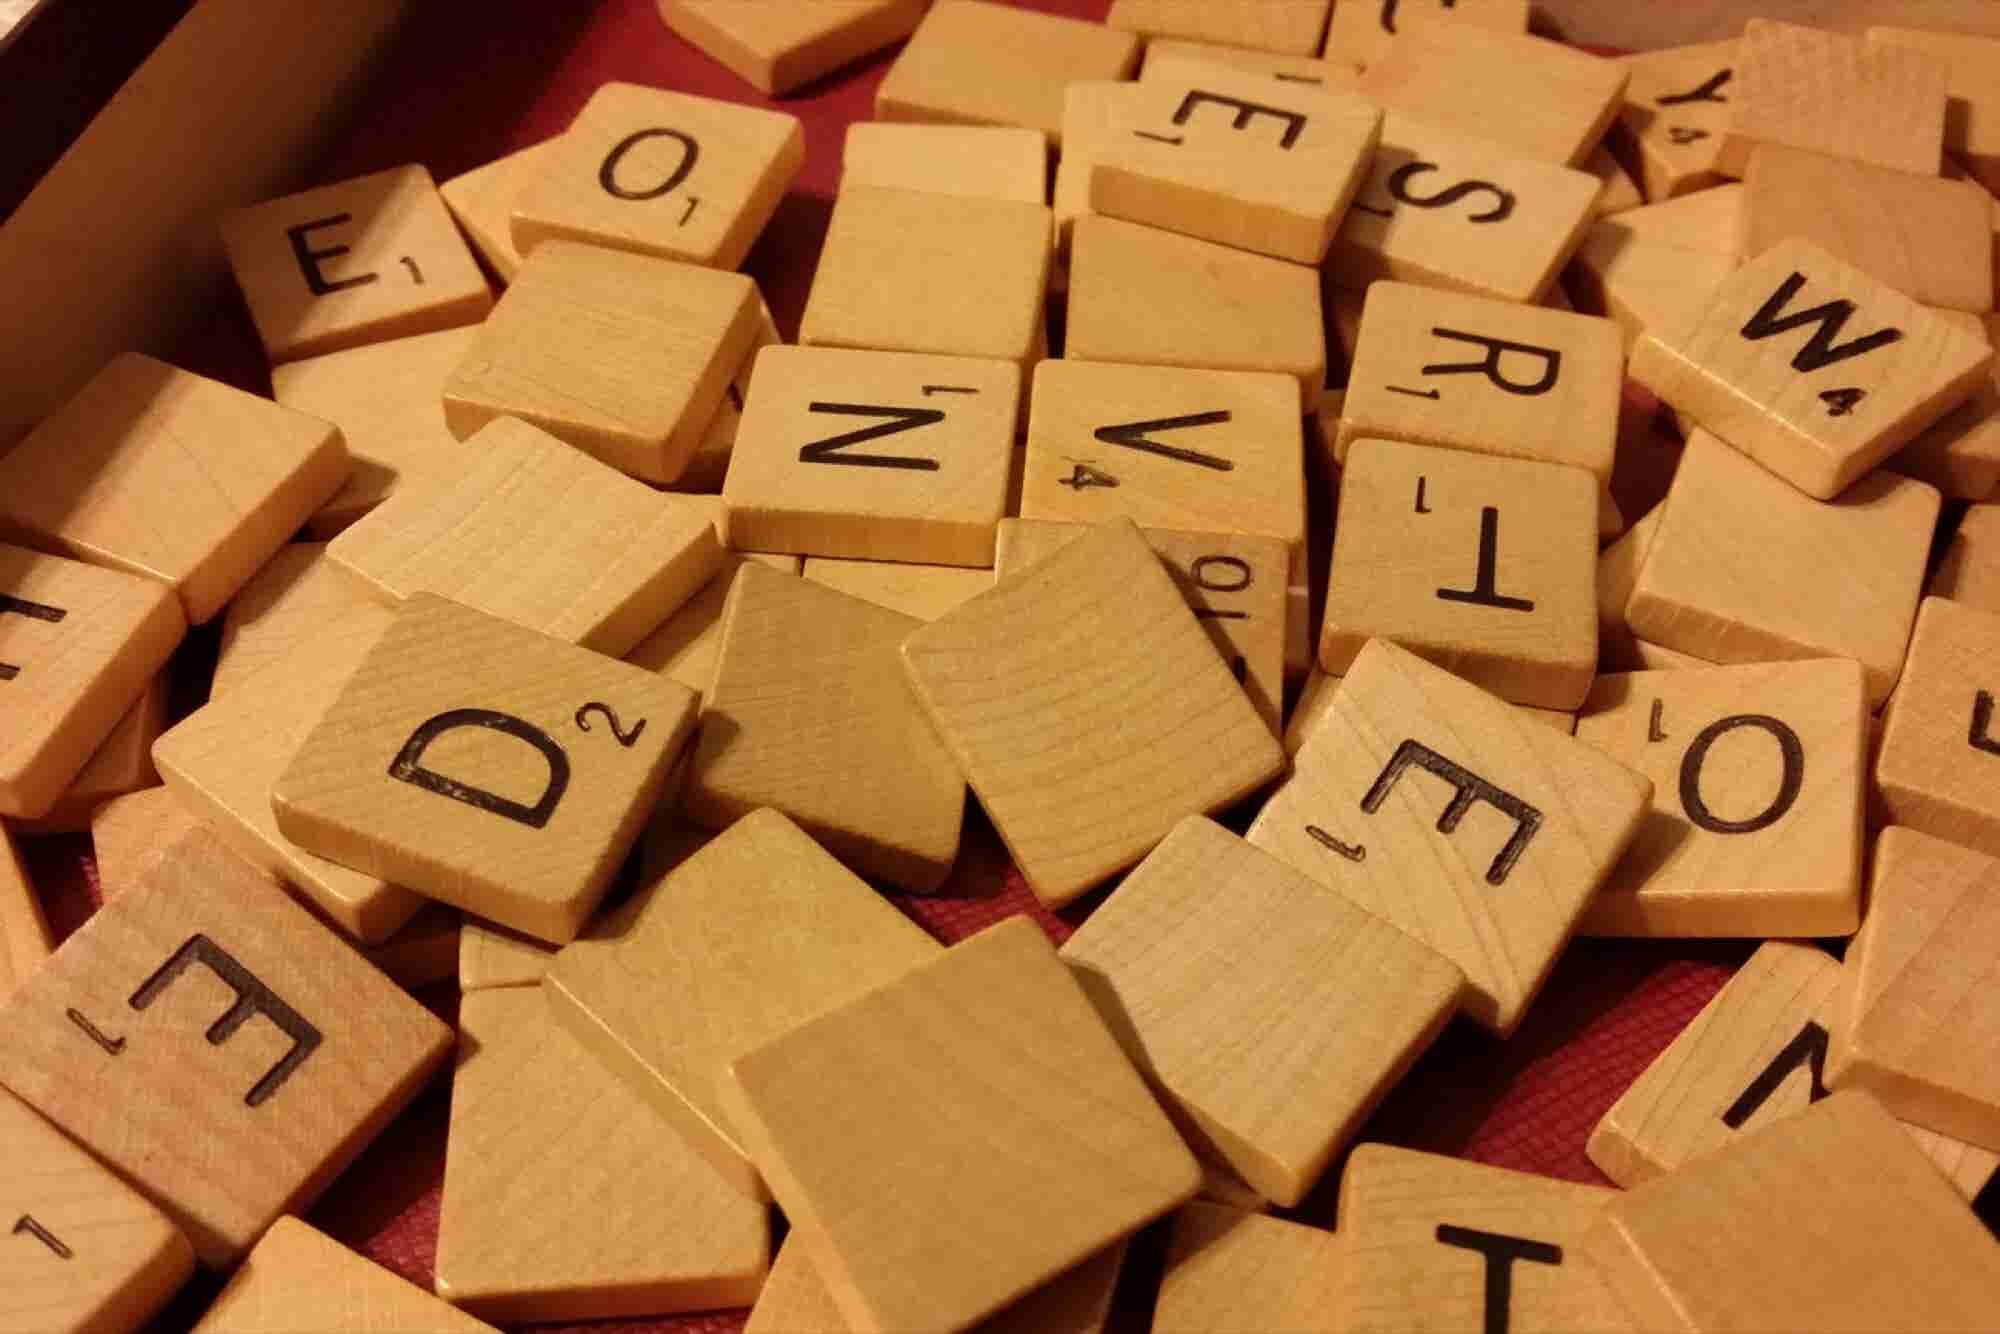 Misused Words That Make Smart People Look Dumb